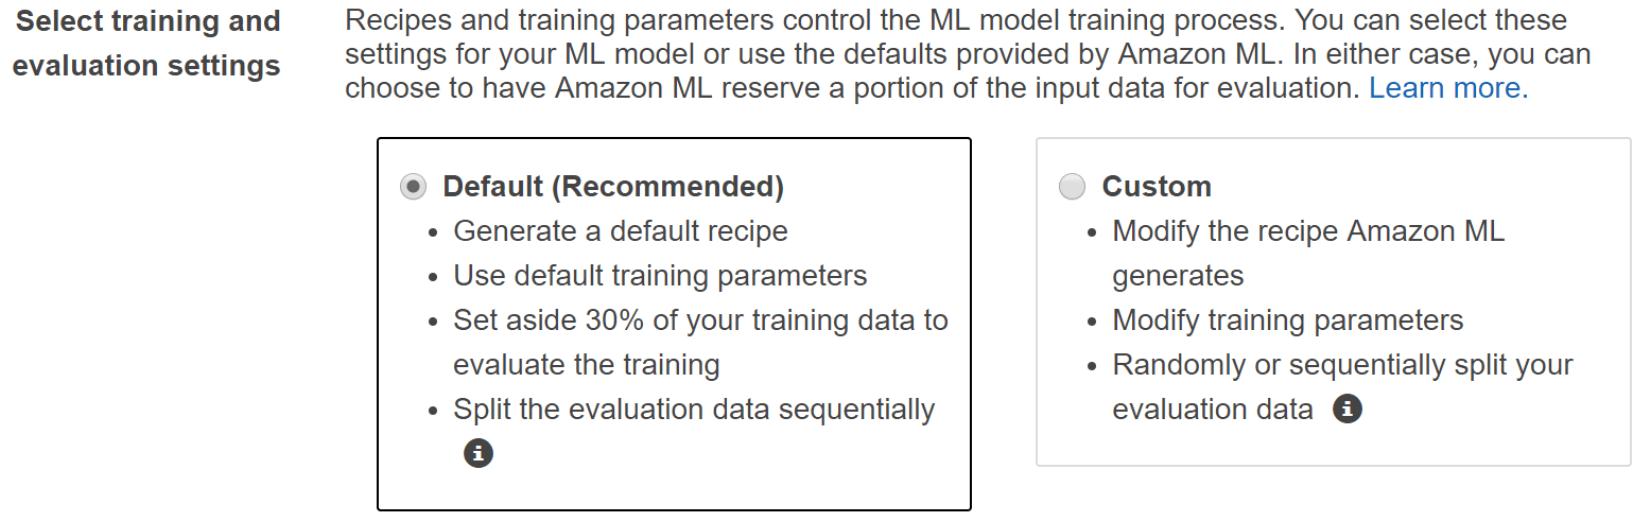 Amazon Machine Learning Model